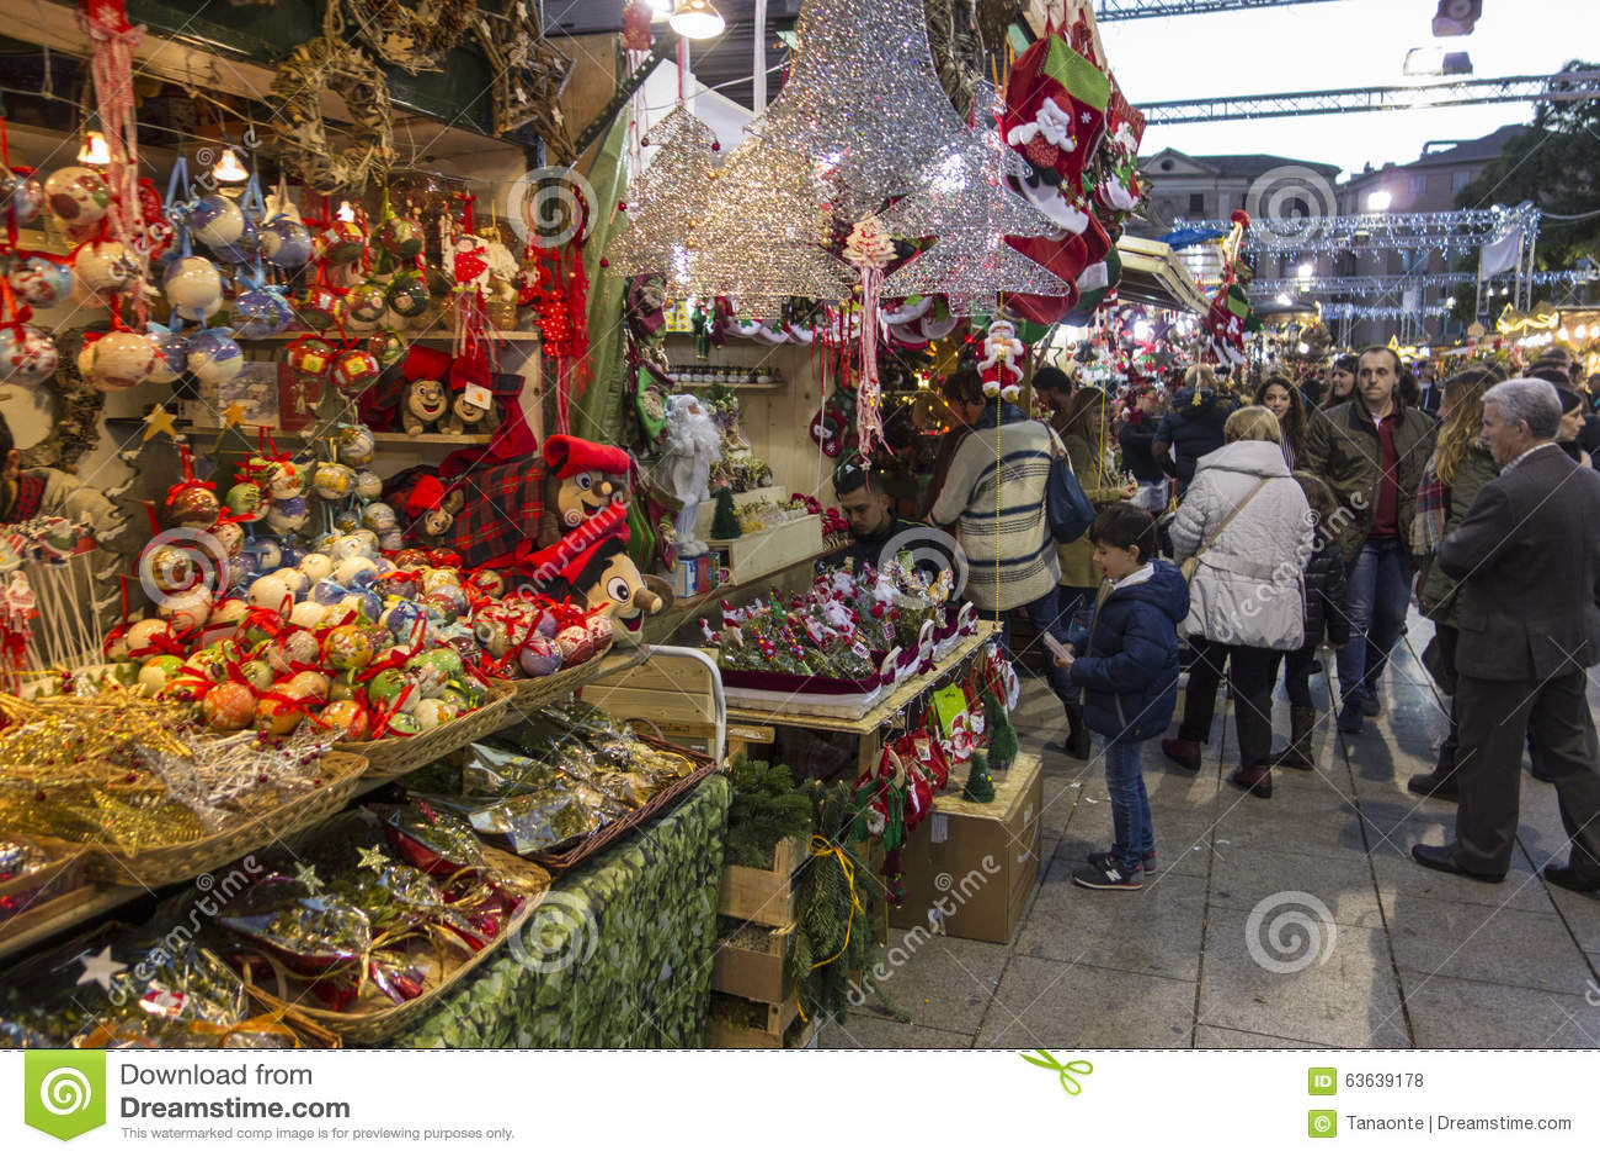 Barcelona, Spain - November 28, 2015: Stands with Christmas gifts in Barcelona, Spain. Fira de Santa Llucia - Christmas market